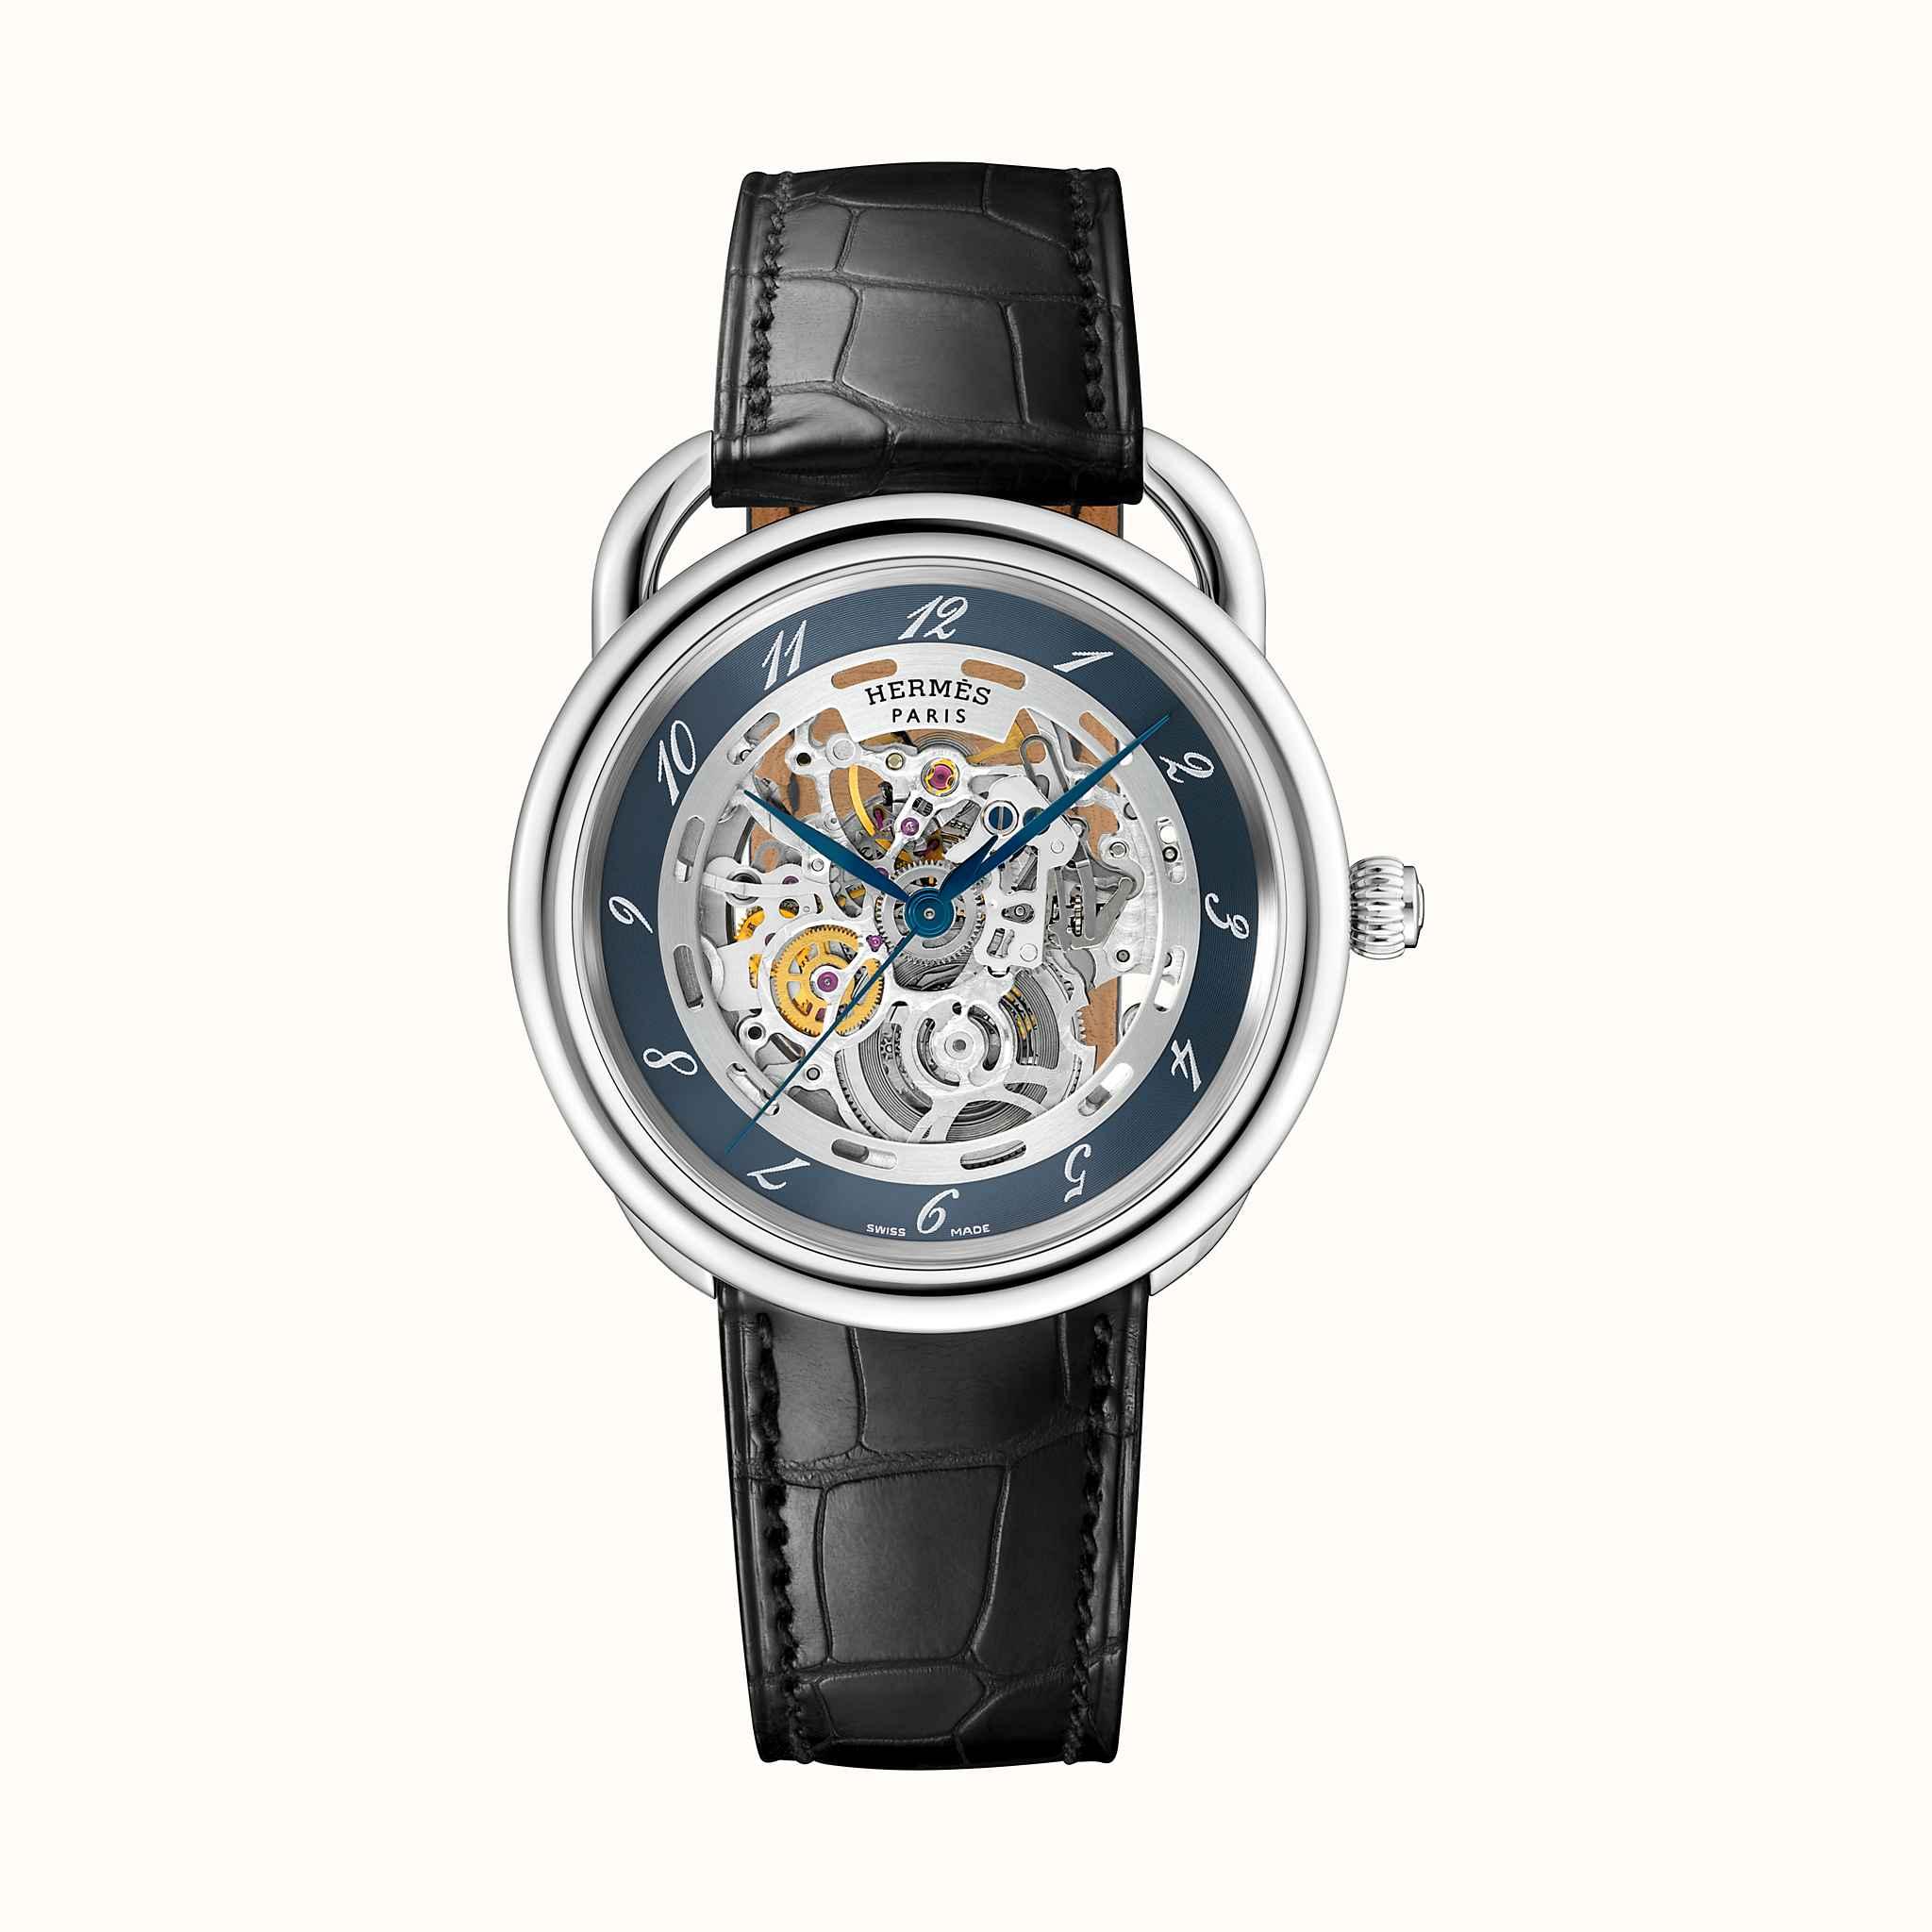 huge discount fb415 54f6c 腕時計 《アルソー》 スケルトン 41 mm